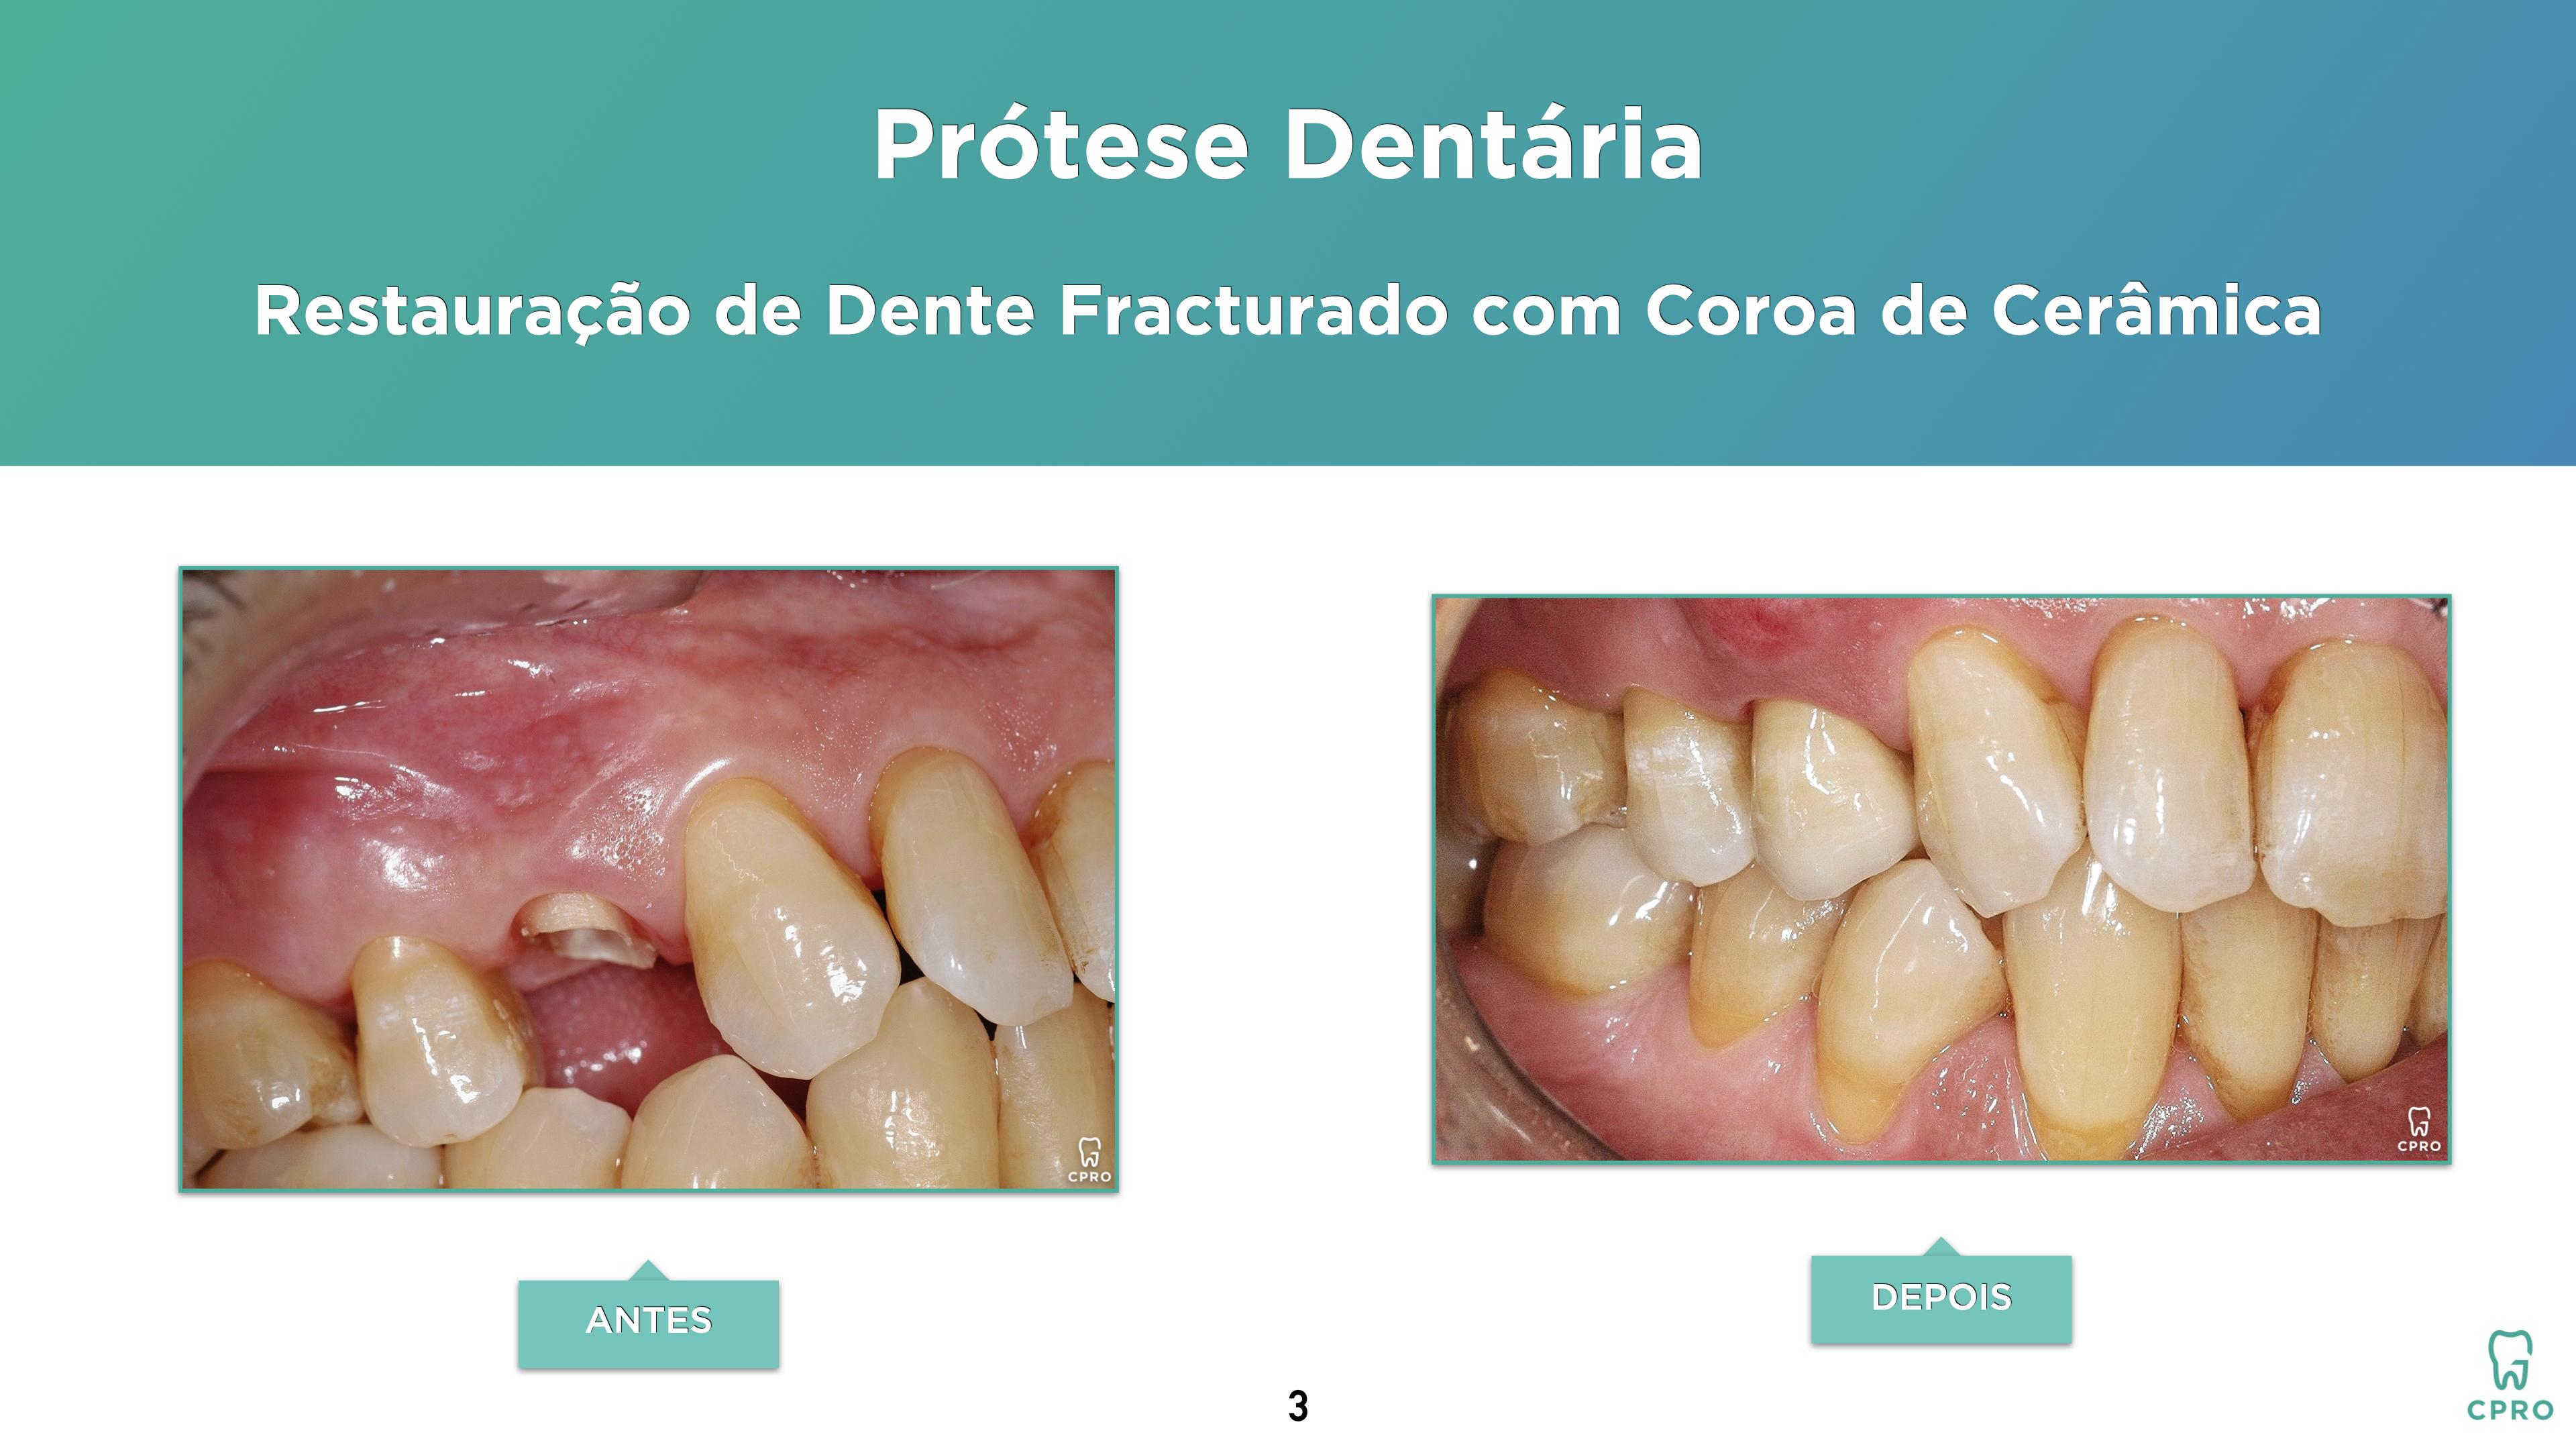 Prótese Dentária | Estética